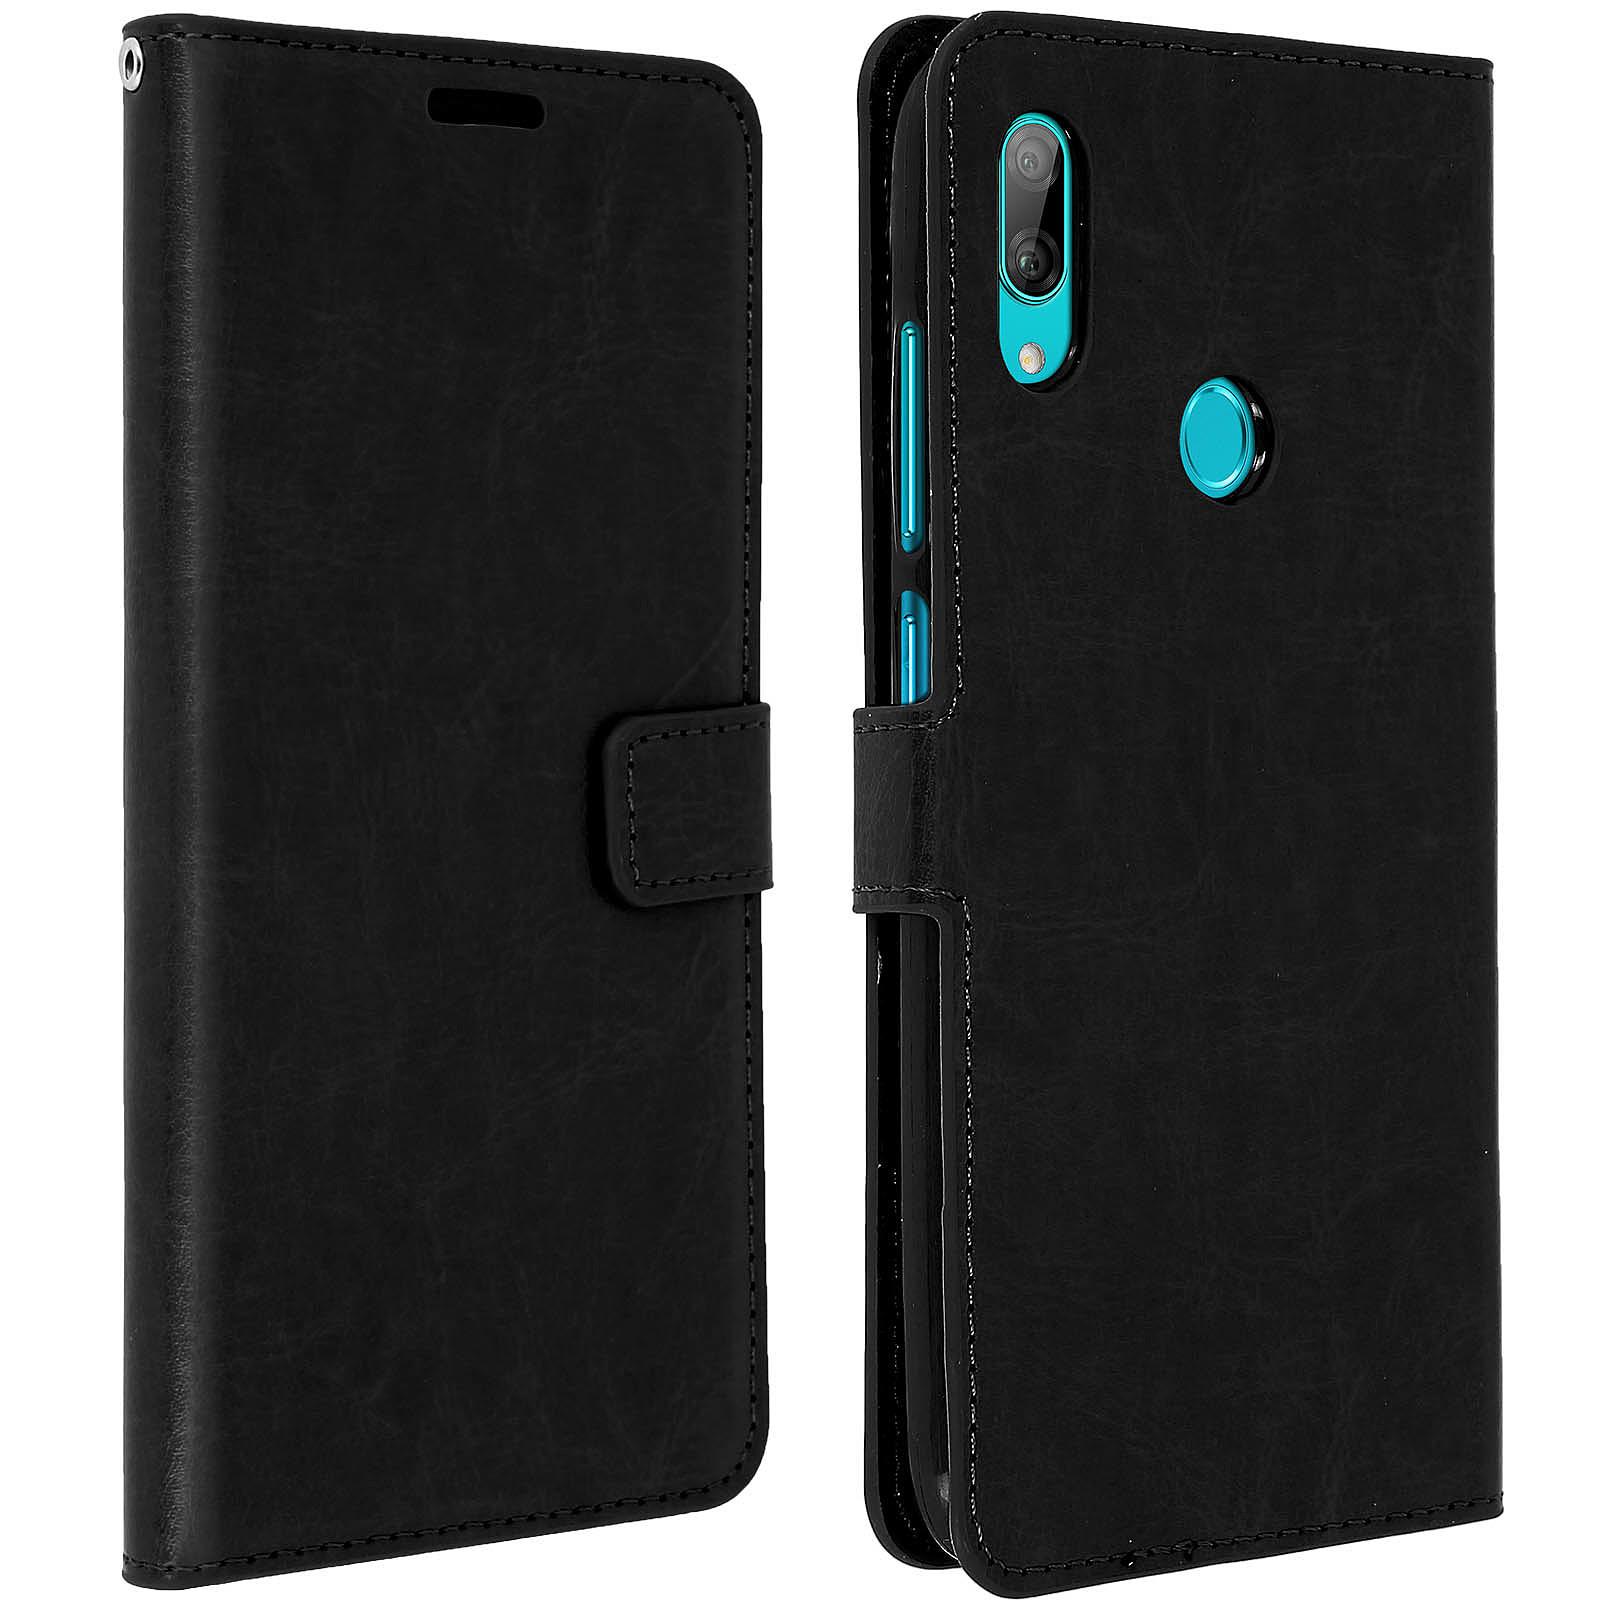 Avizar Etui folio Noir Éco-cuir pour Huawei Y7 2019